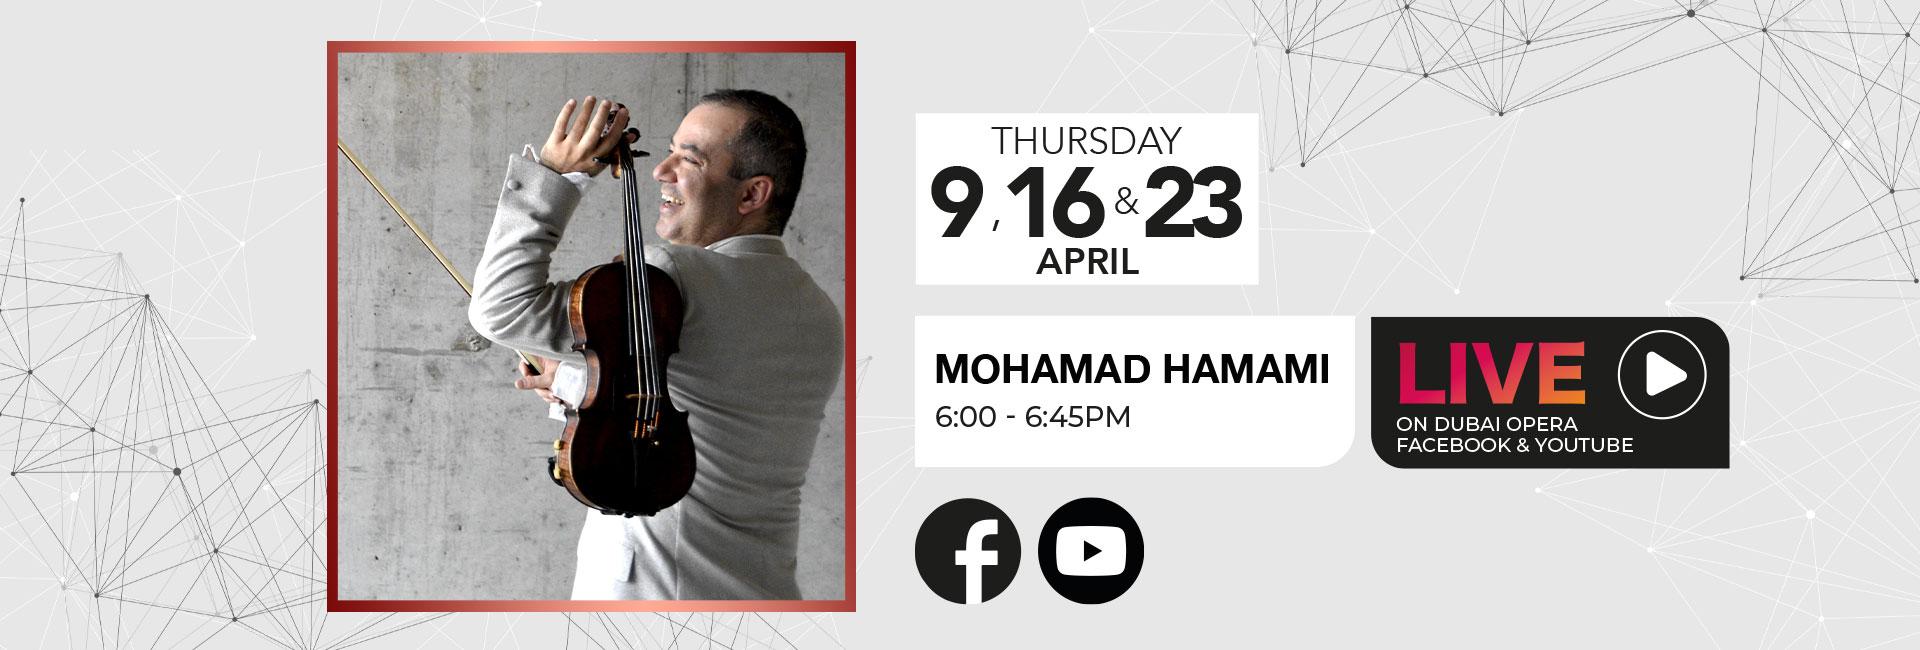 Virtual Concert: Mohamad Hamami Live Dubai 2020